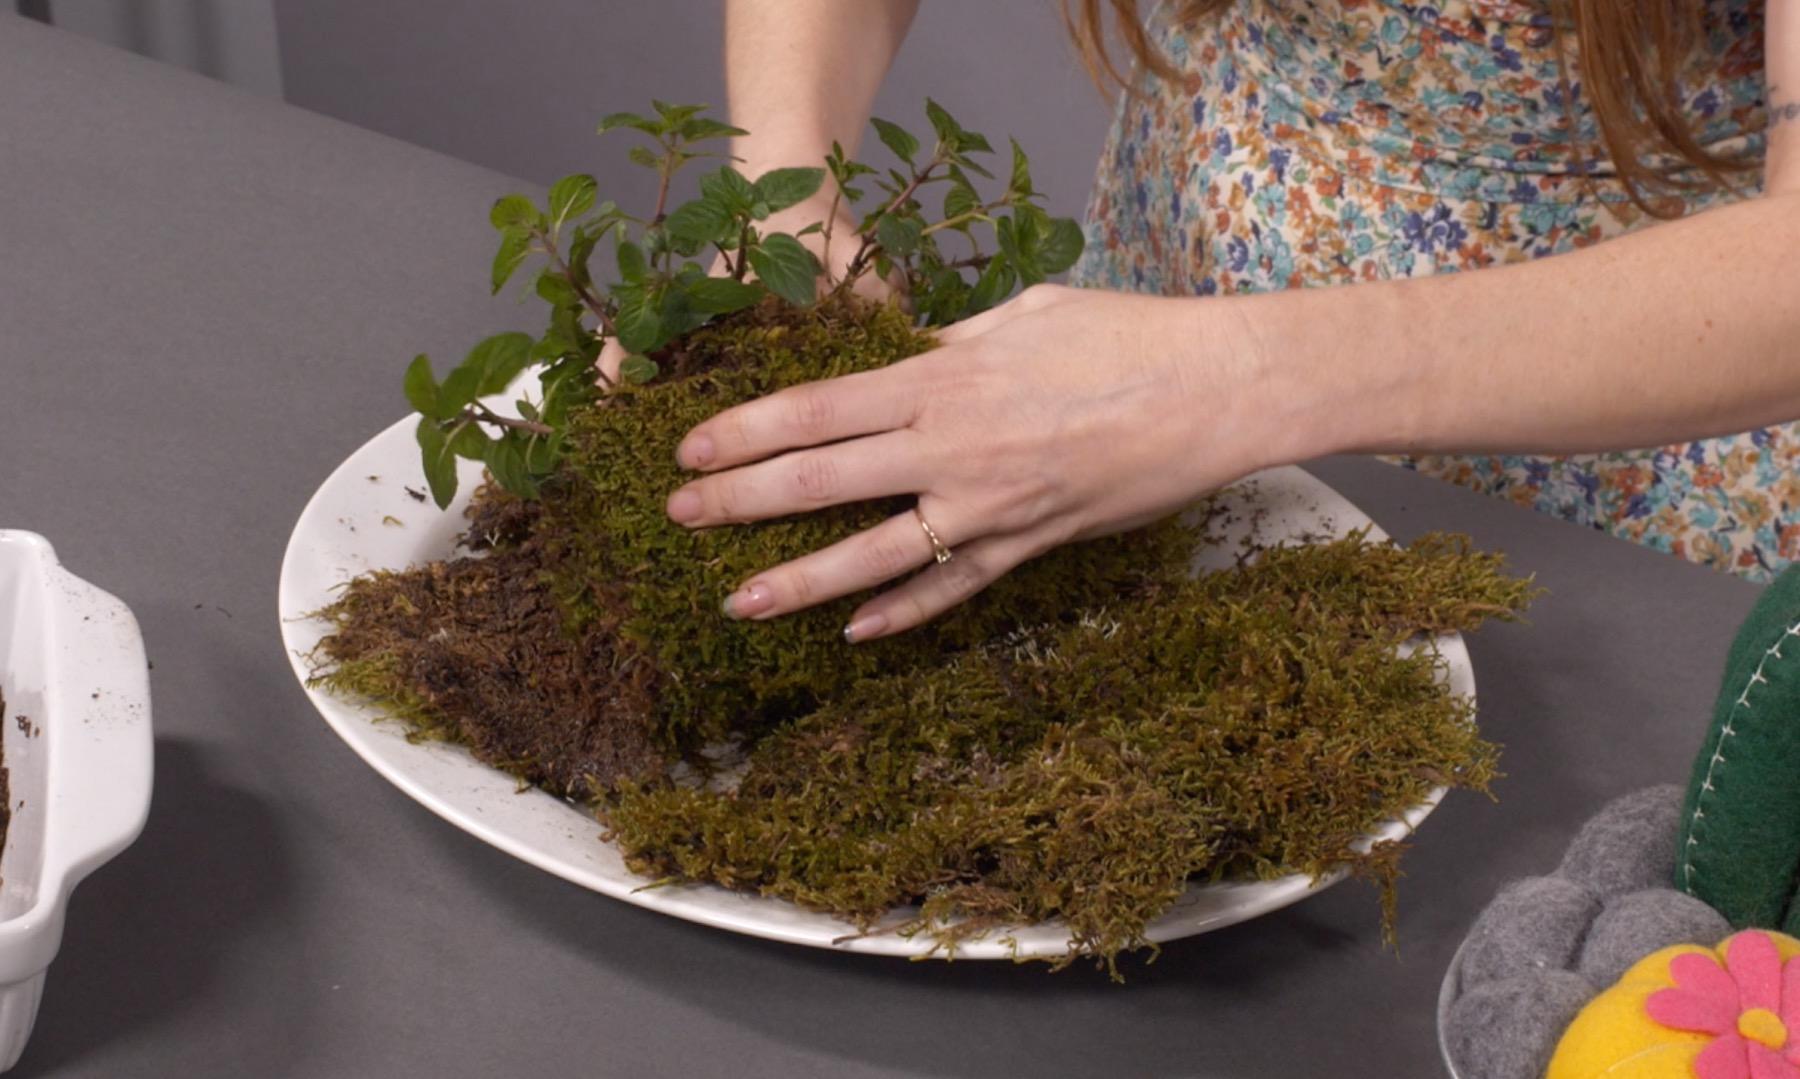 kokedama gardening tutorial wrap the reindeer moss around the plant